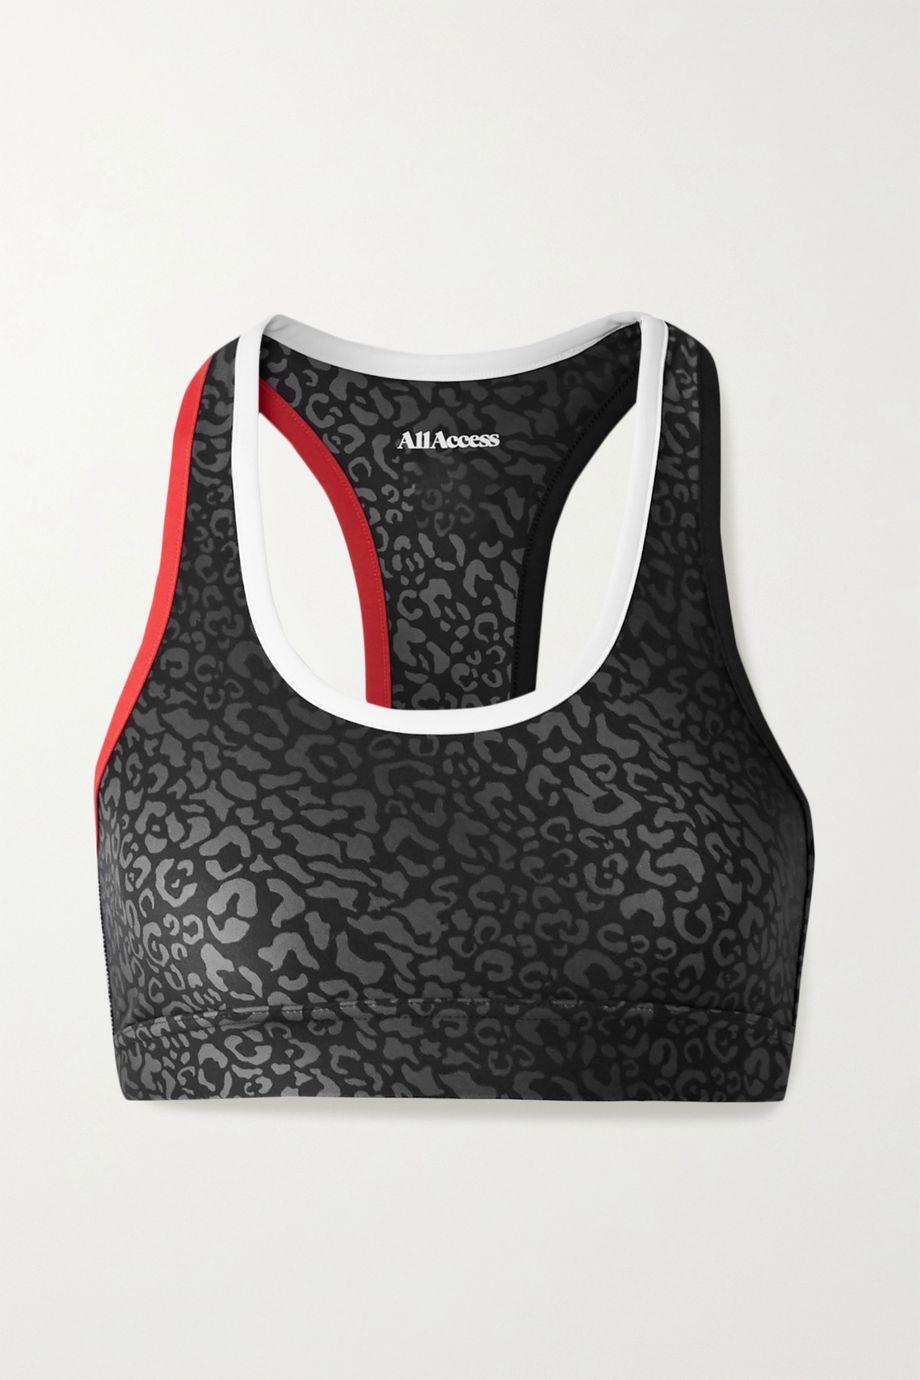 All Access Front Row leopard-print stretch sports bra